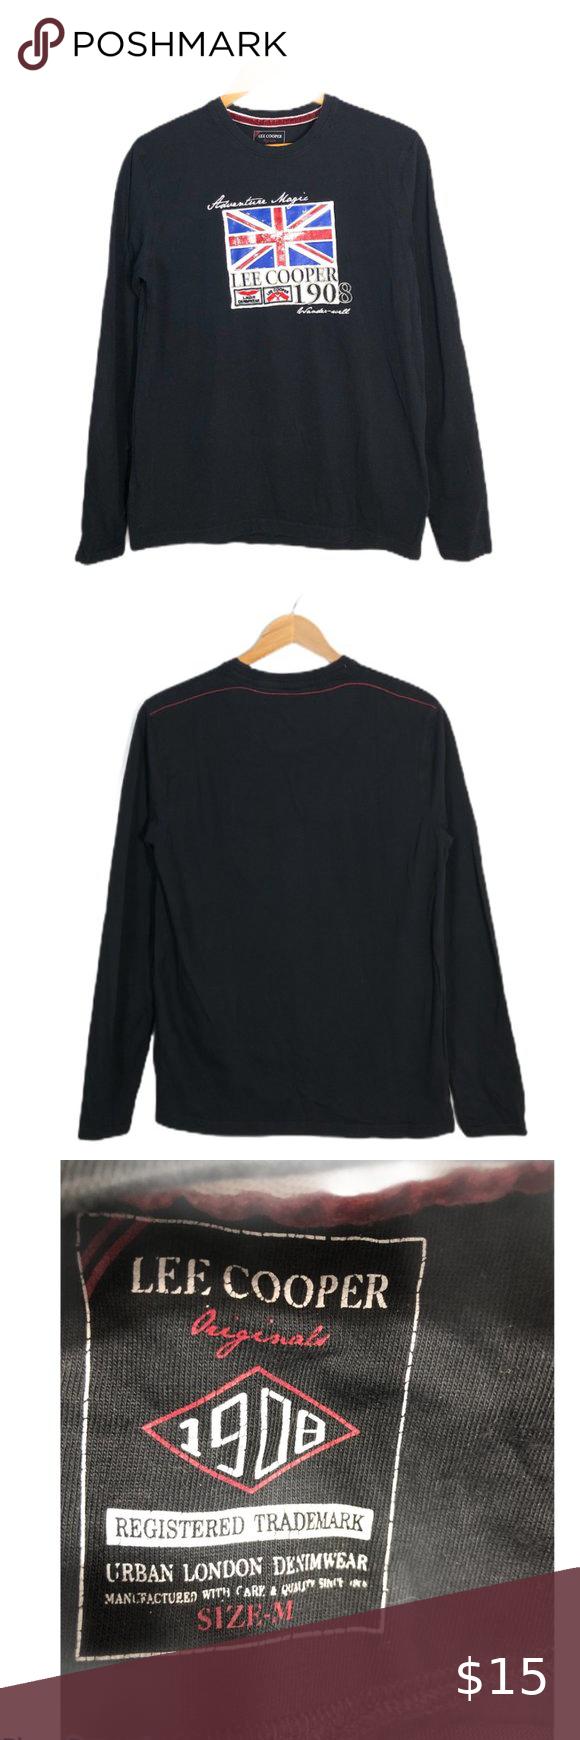 Lee Cooper1908 Britain Black Longsleeve Shirt M Black Long Sleeve Shirt Long Sleeve Shirts Long Sleeve [ 1740 x 580 Pixel ]